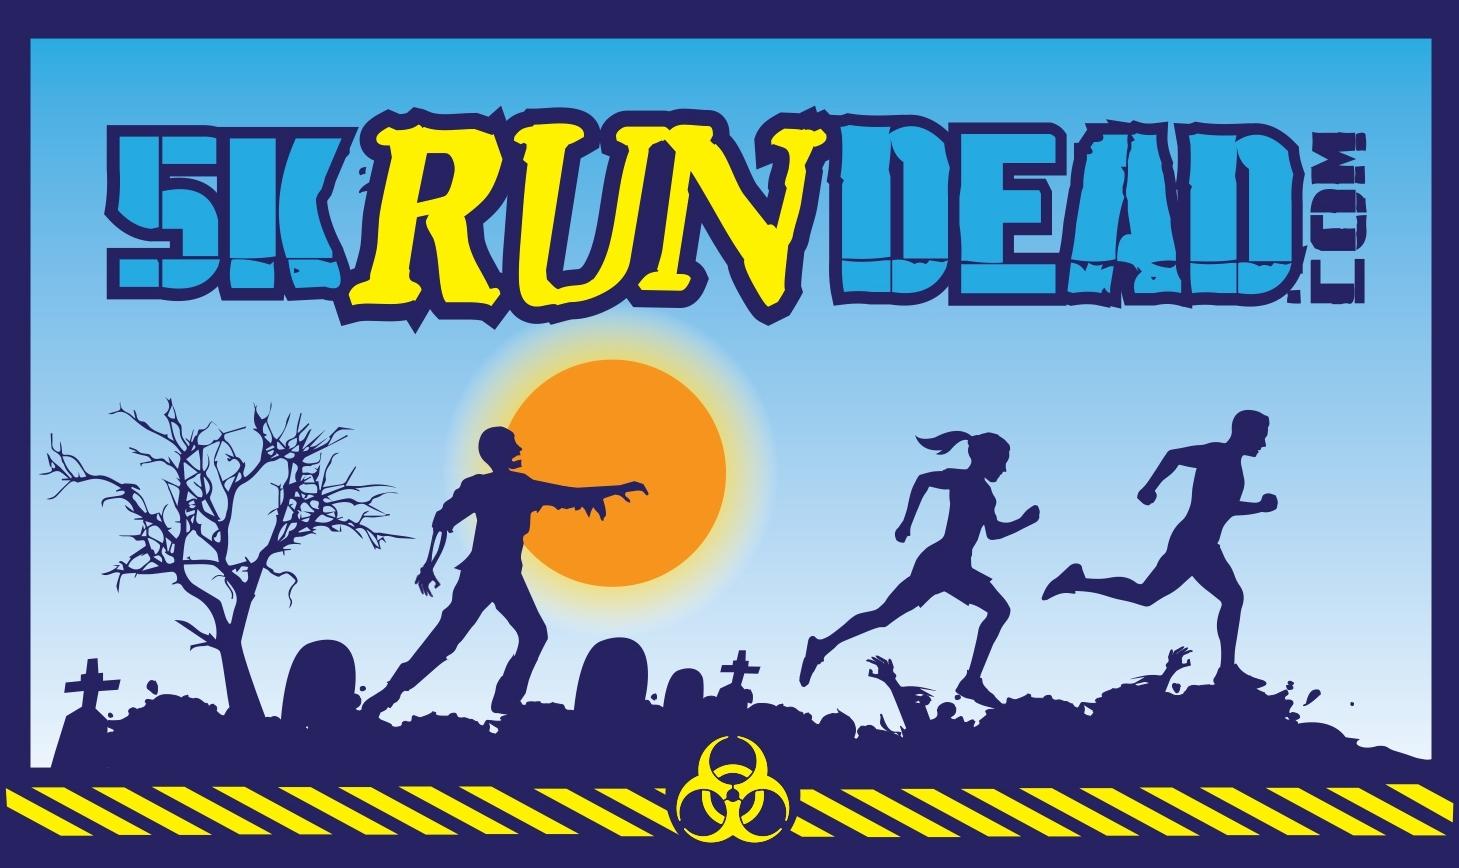 images.raceentry.com/infopages/5krundead-zombie-run-oklahoma-city-ok-infopages-1990.jpg